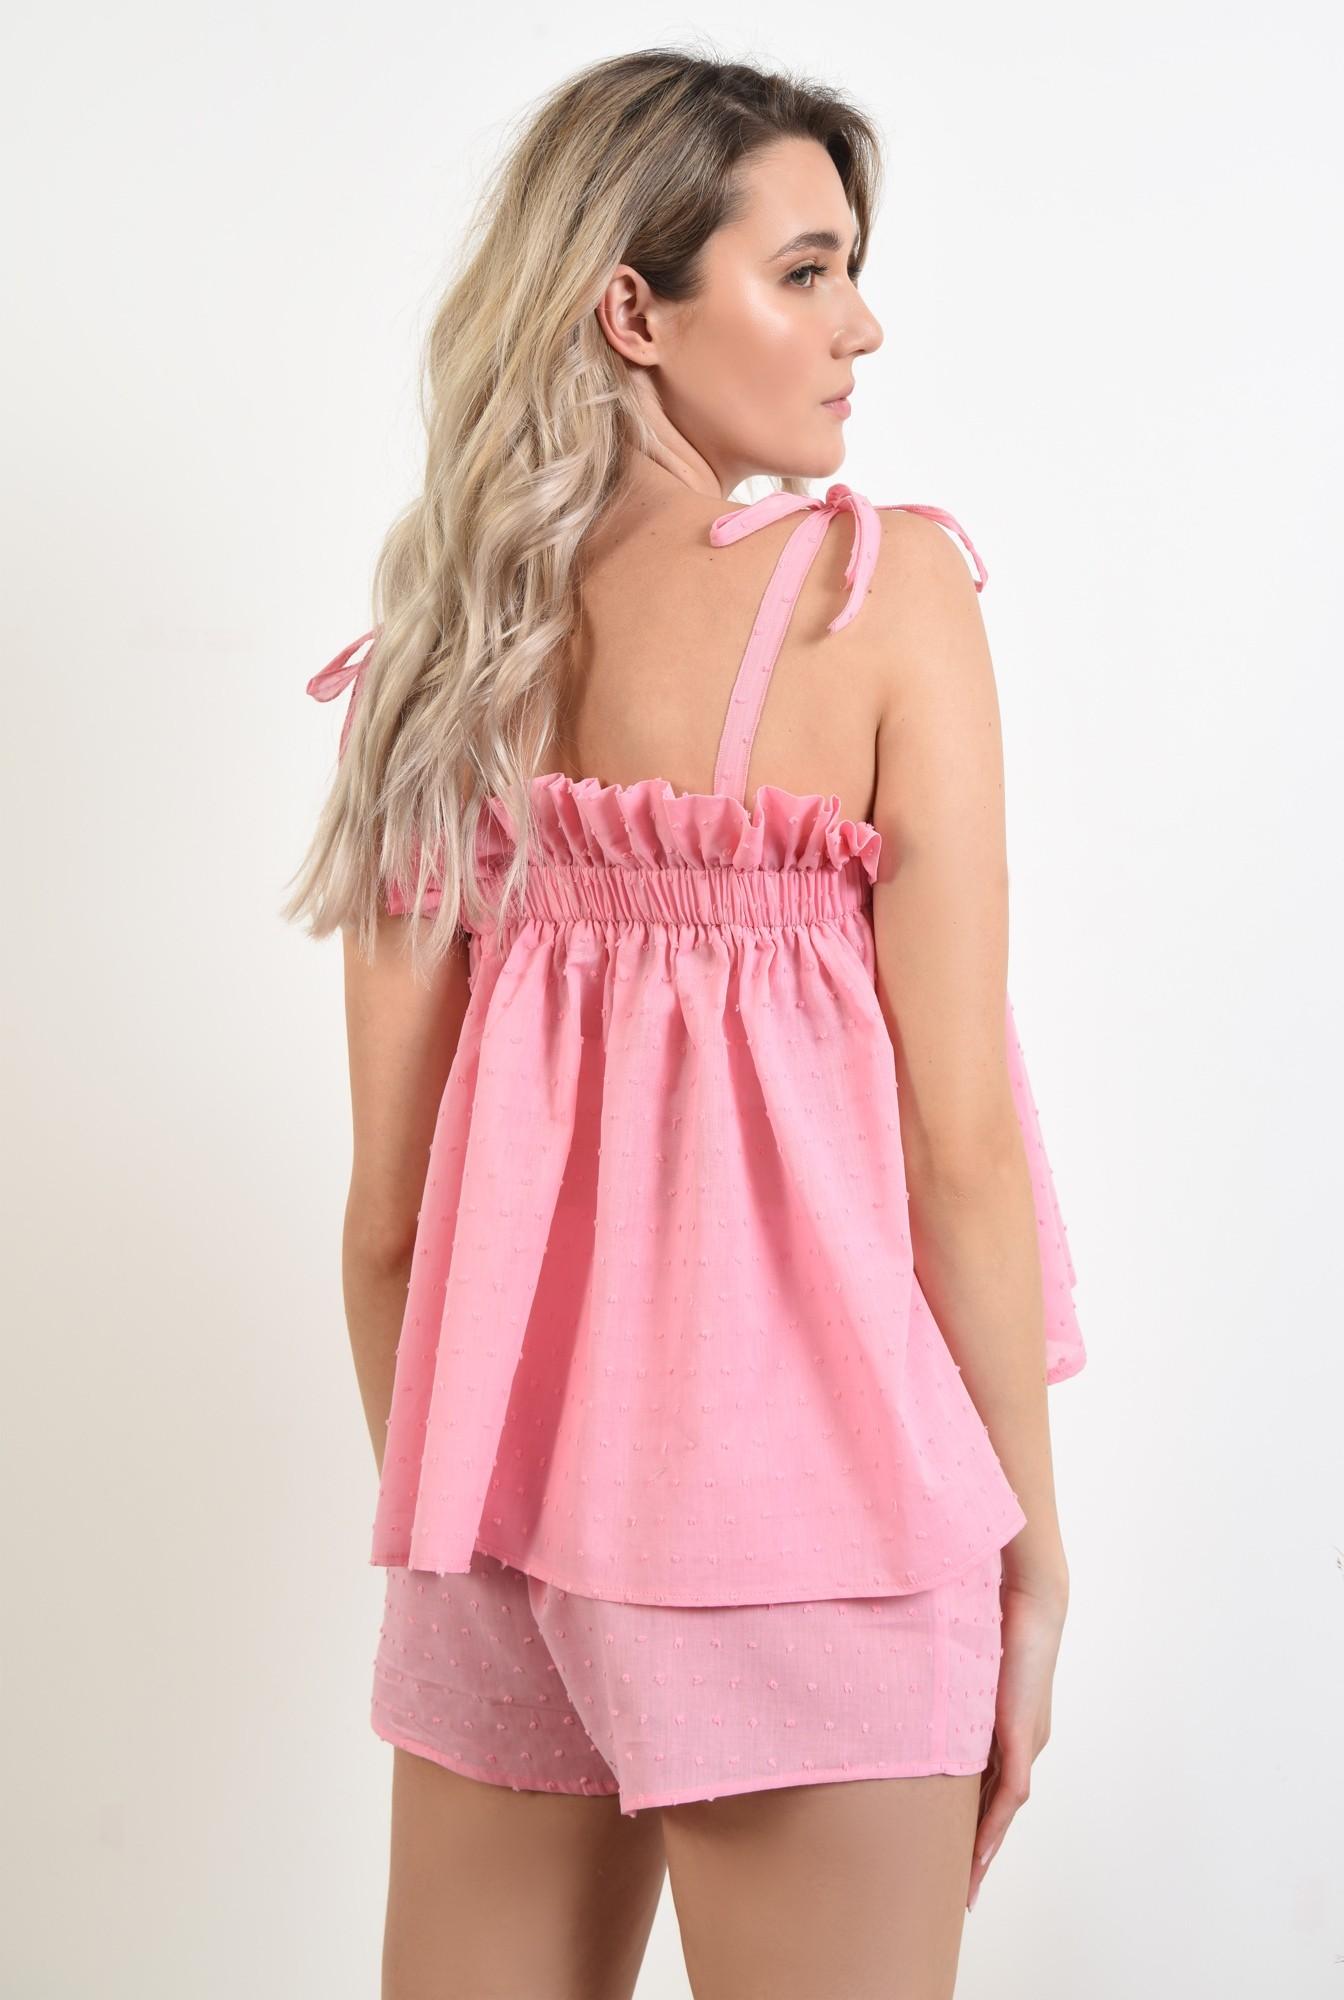 1 - 360 - pantaloni scurti, casual, plumeti, roz, sort plumeti